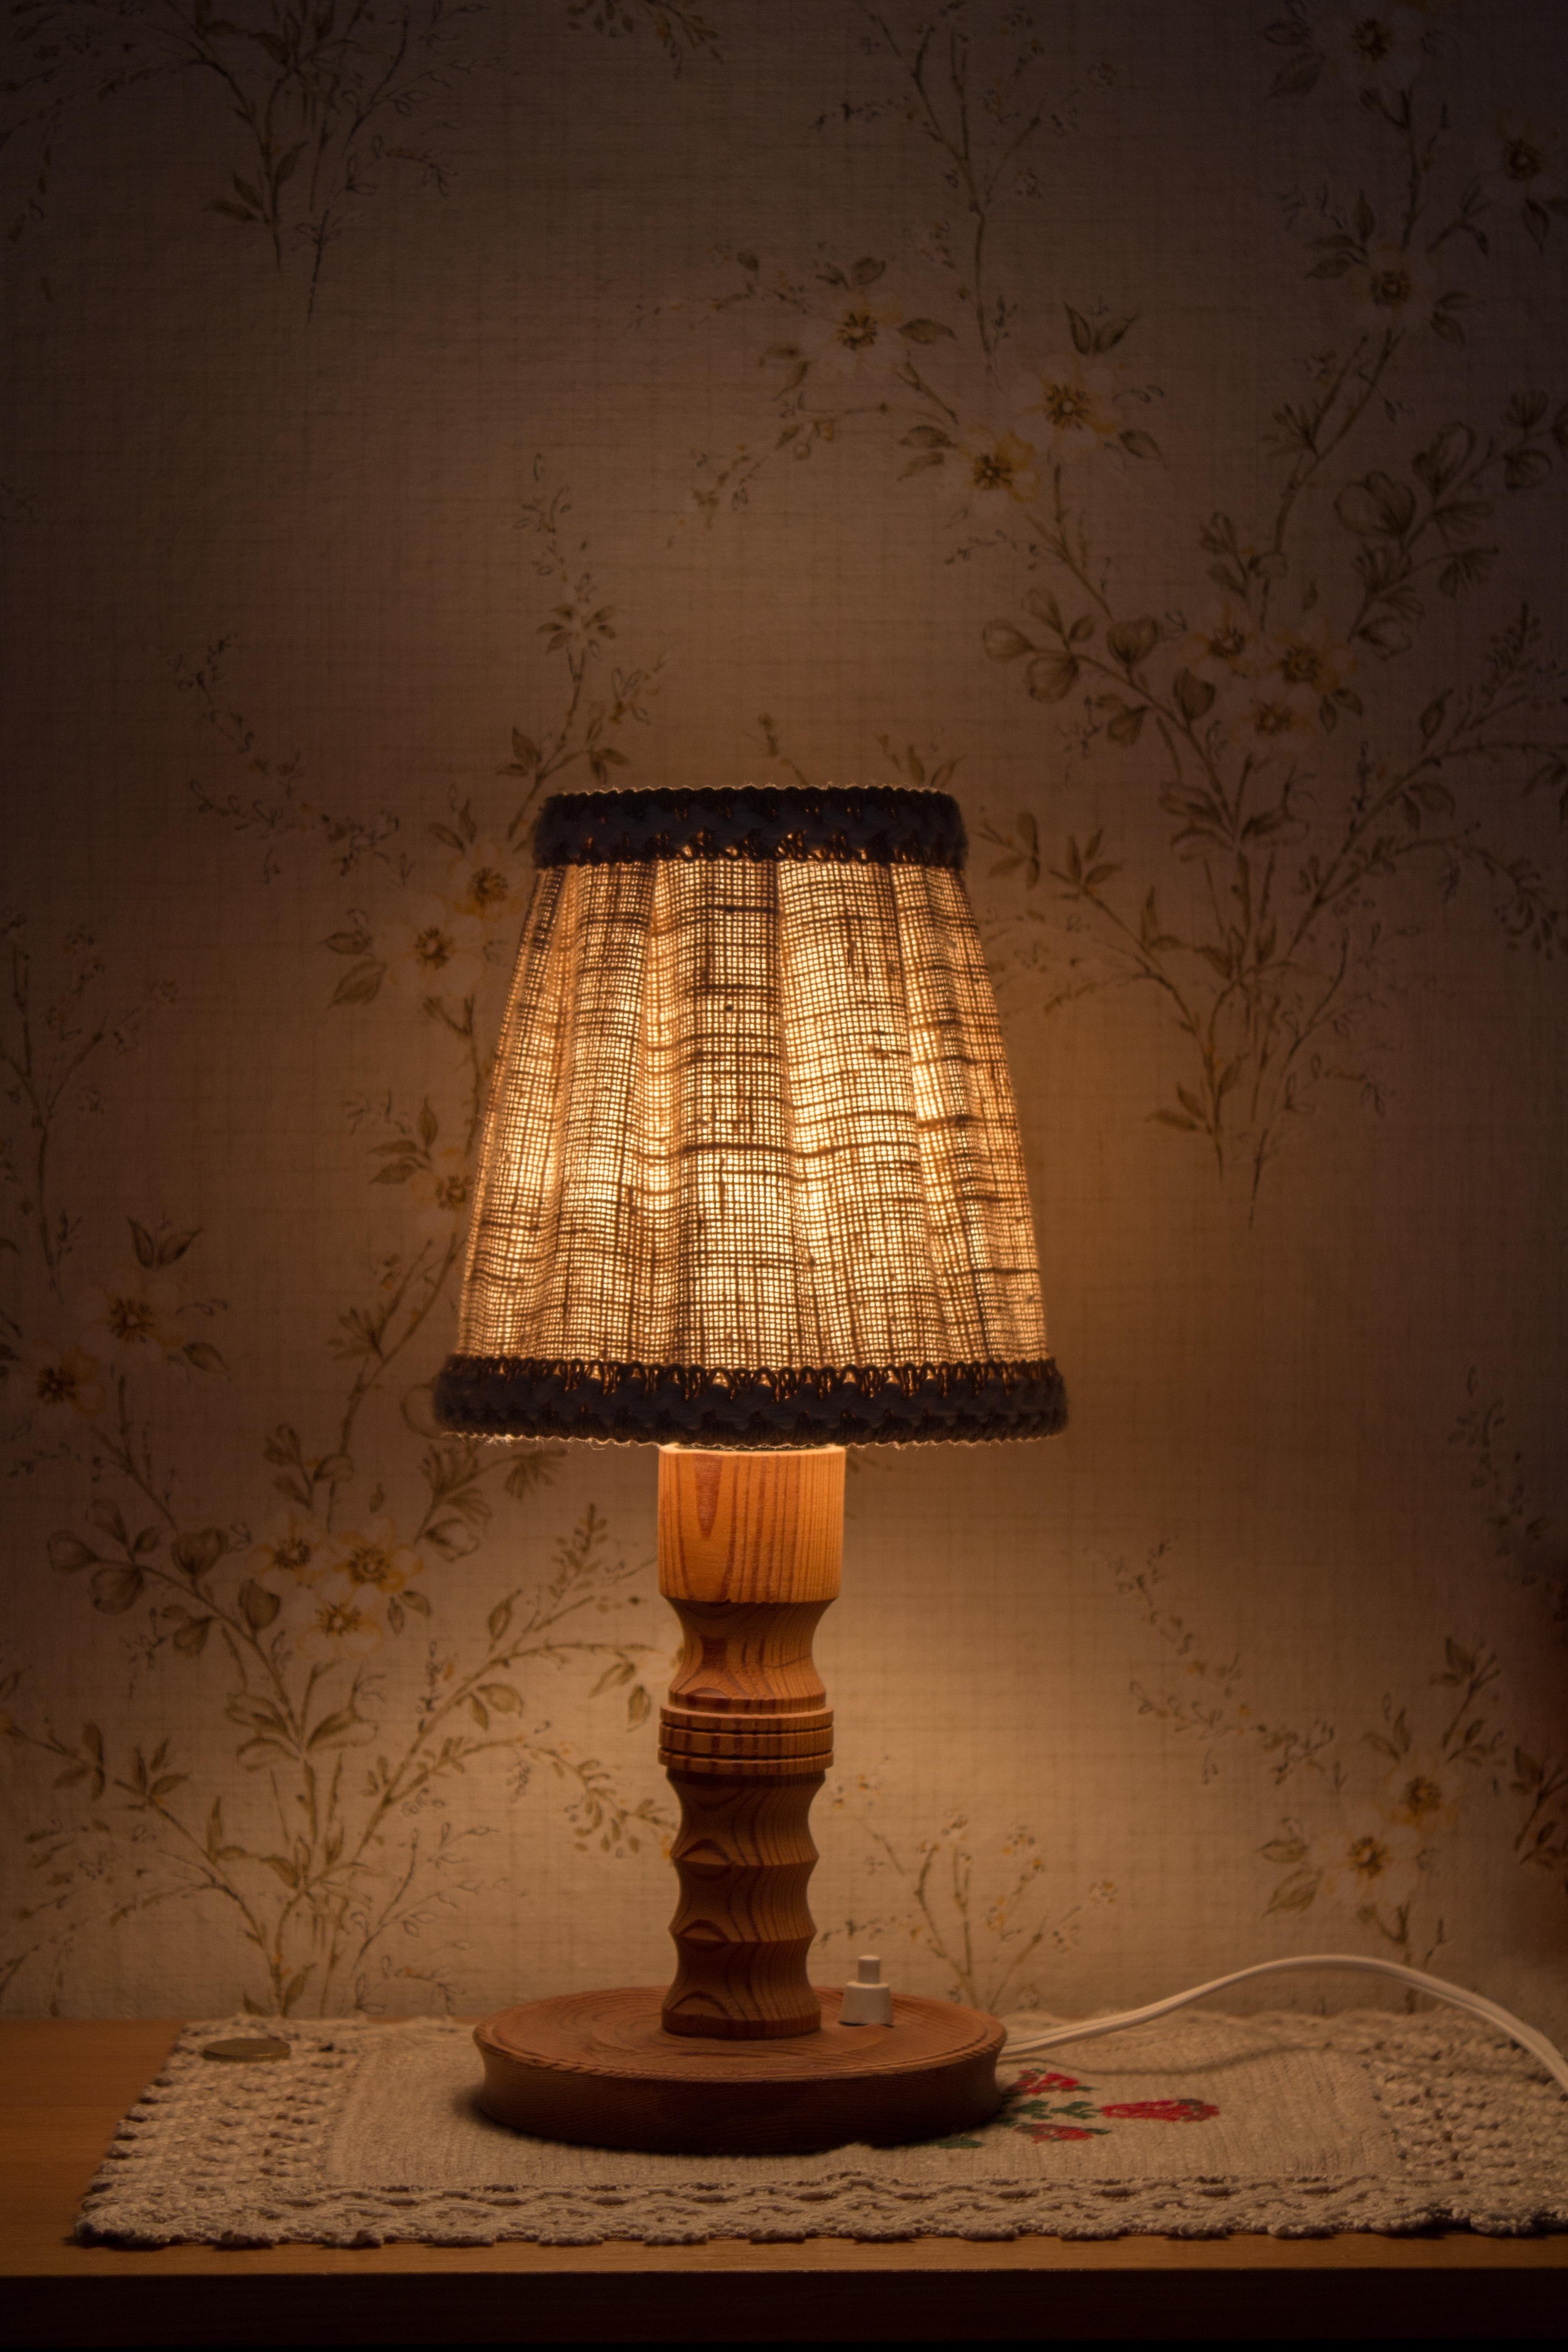 images gratuites bois atmosph re rustique r fraction plafond lanterne lampe jaune abat. Black Bedroom Furniture Sets. Home Design Ideas